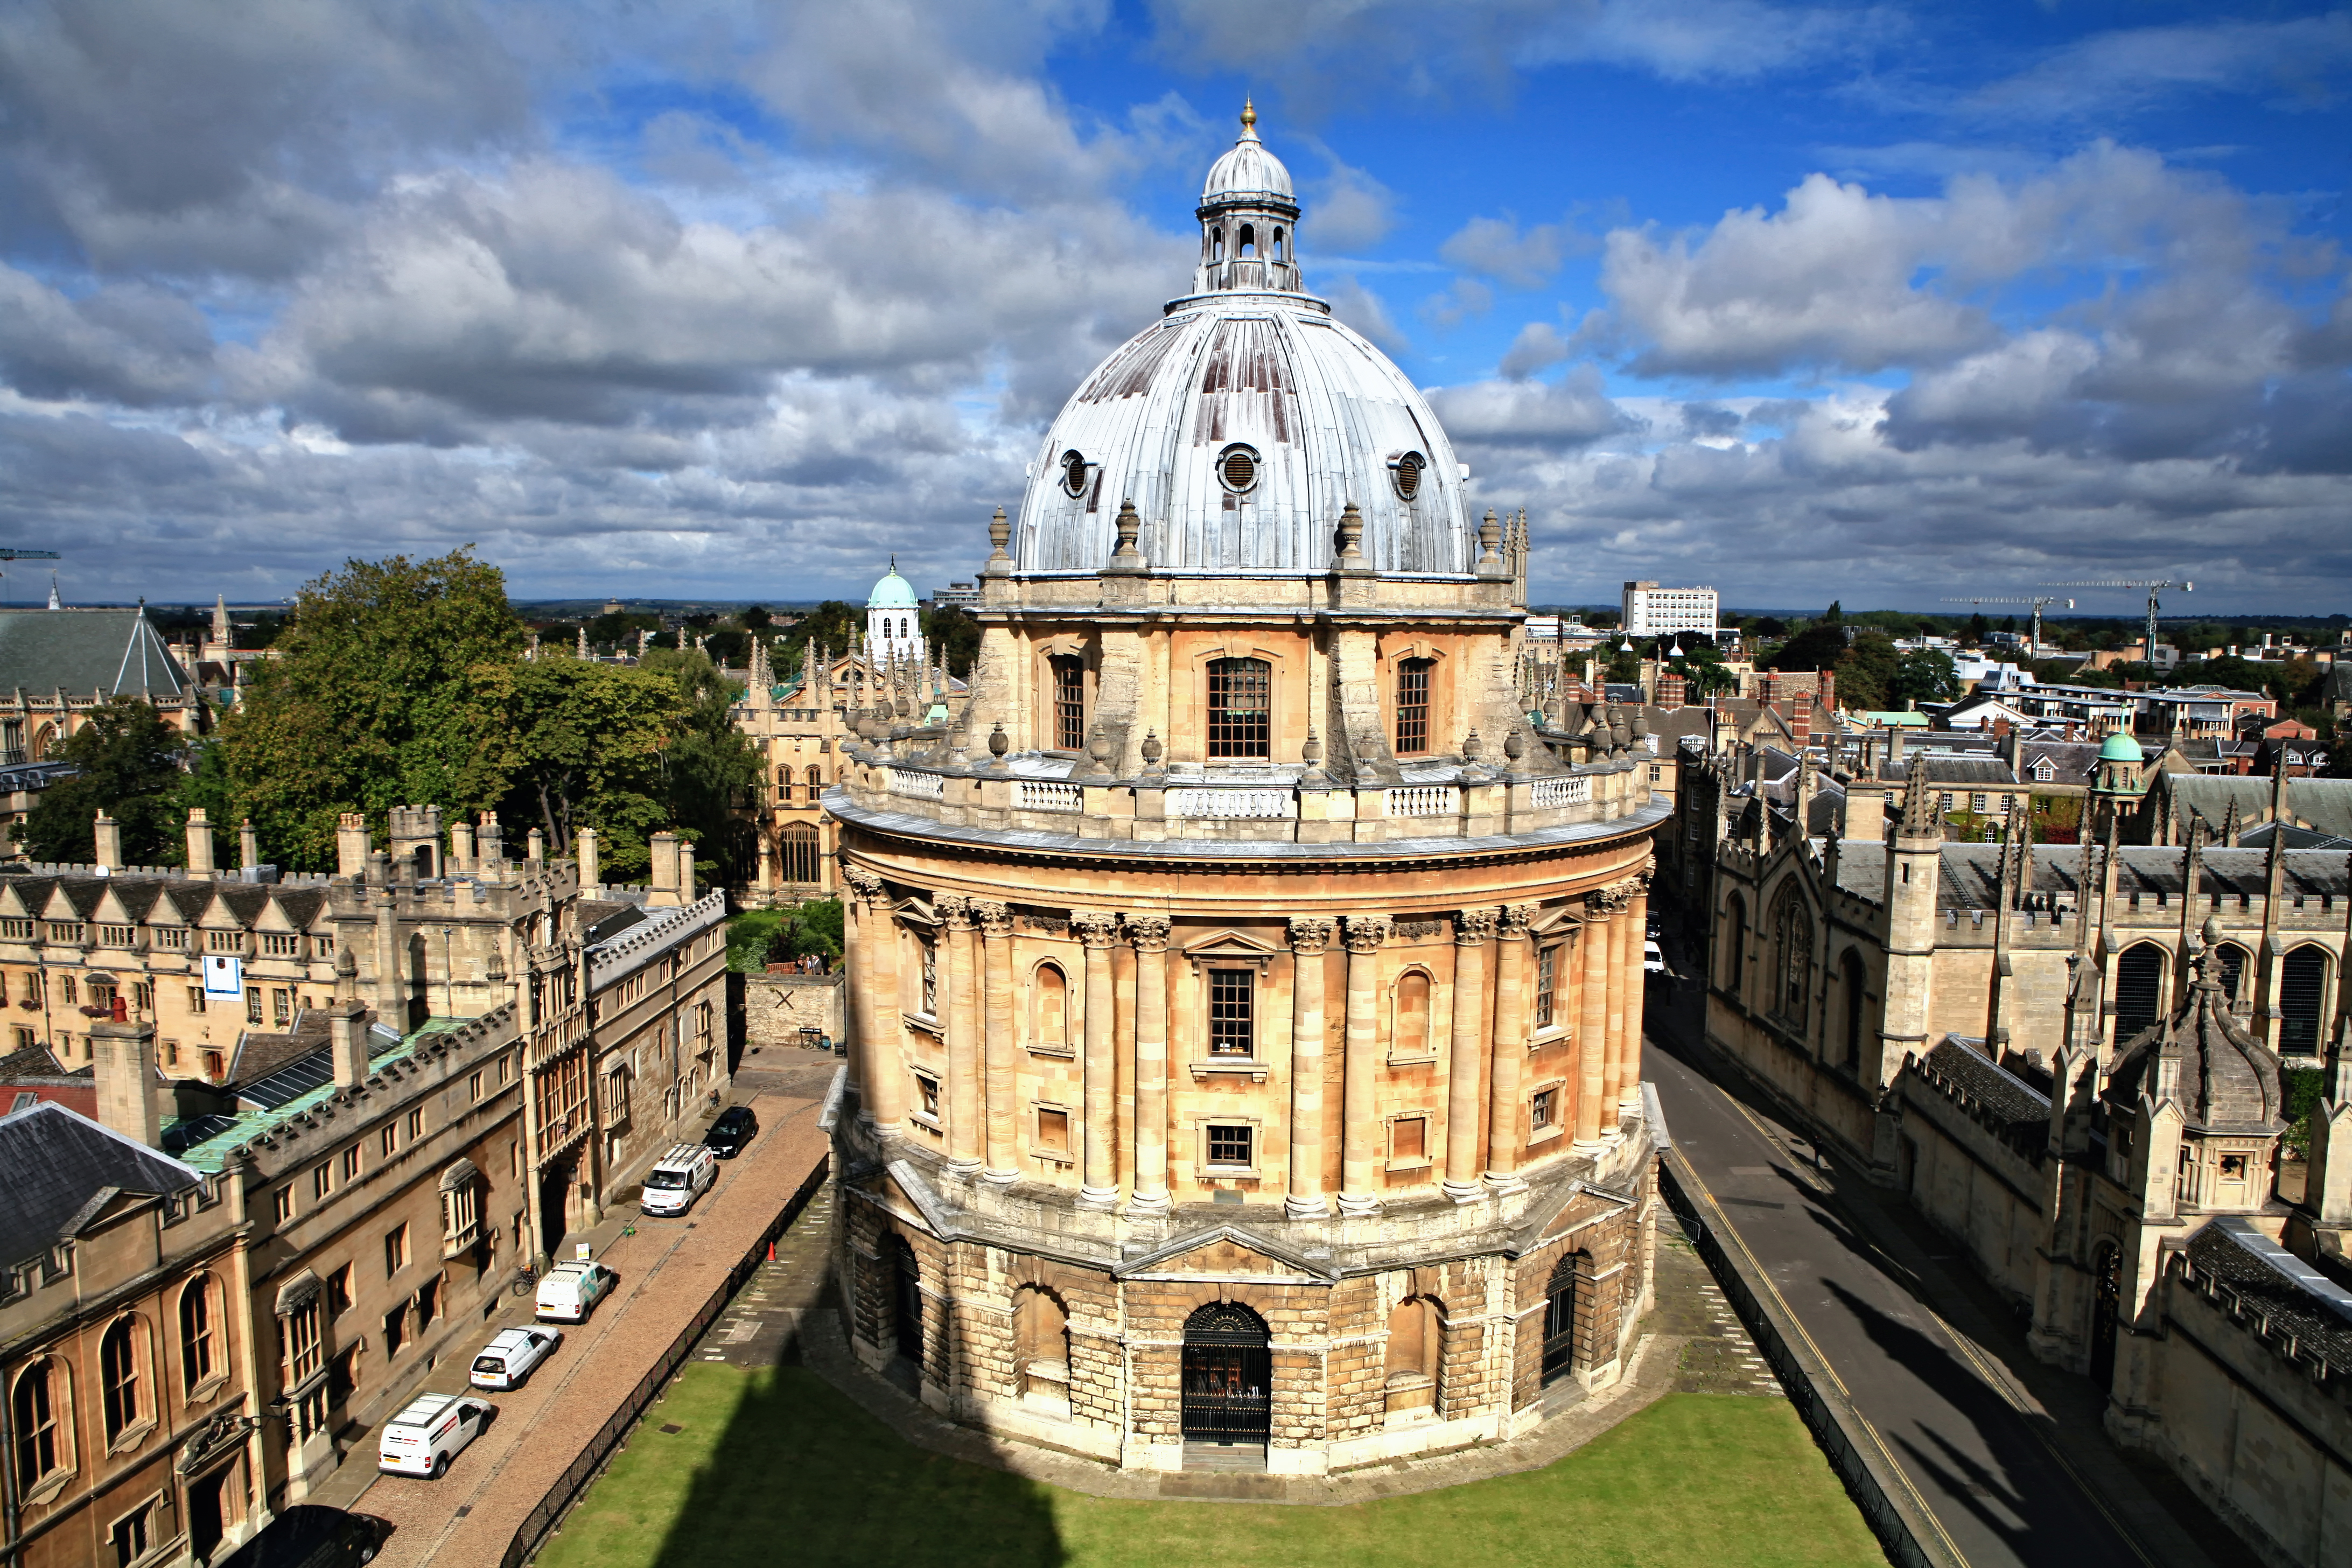 Топ 7 забележителности в Оксфорд